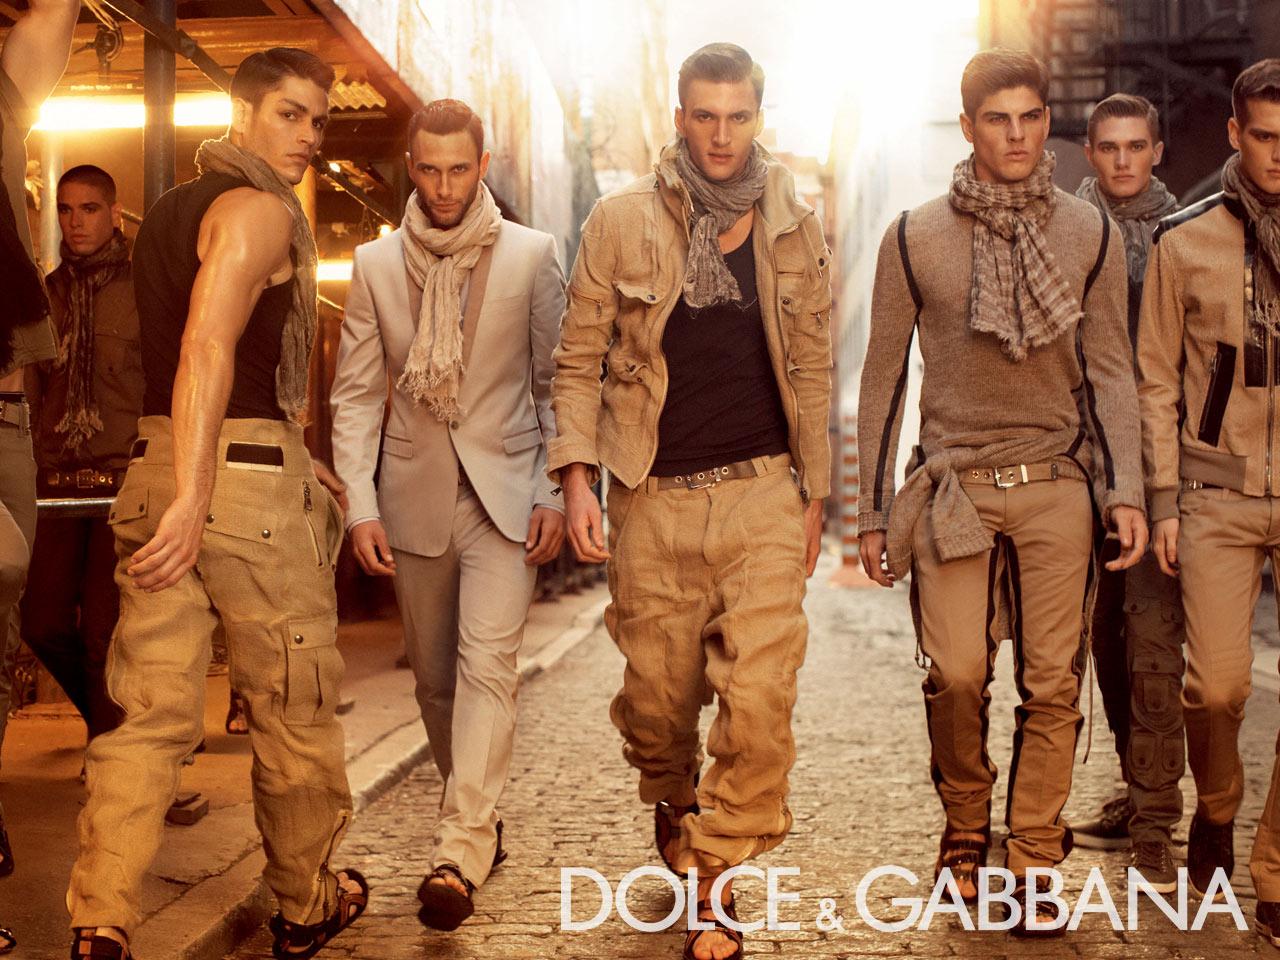 Dolce And Gabbana Wallpaper - WallpaperSafari